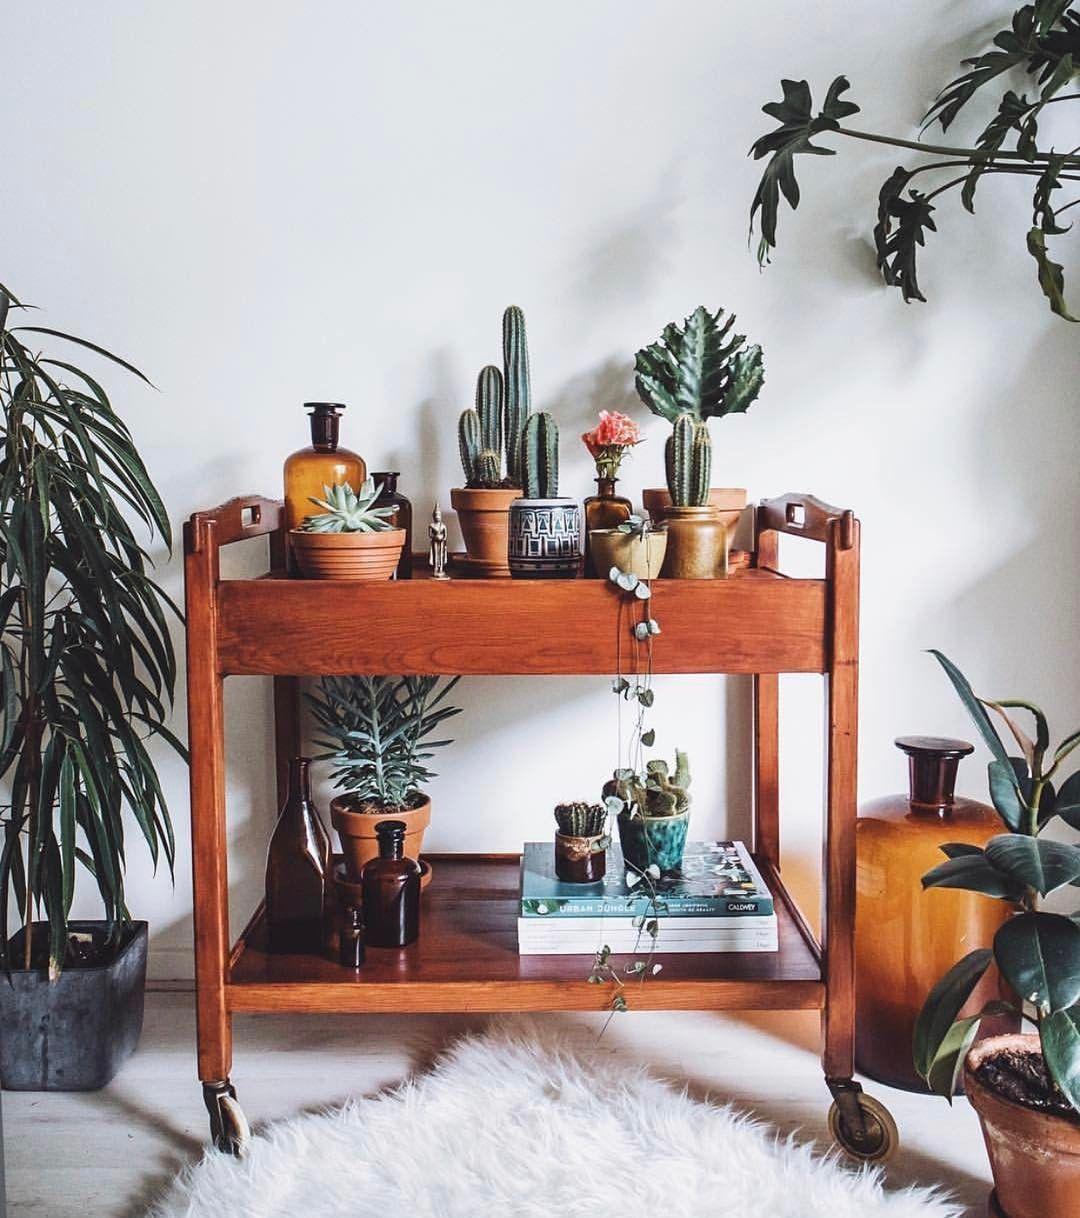 Interior-Trend: Boho-Deko | Interior inspo | Pinterest | Deko, Boho ...